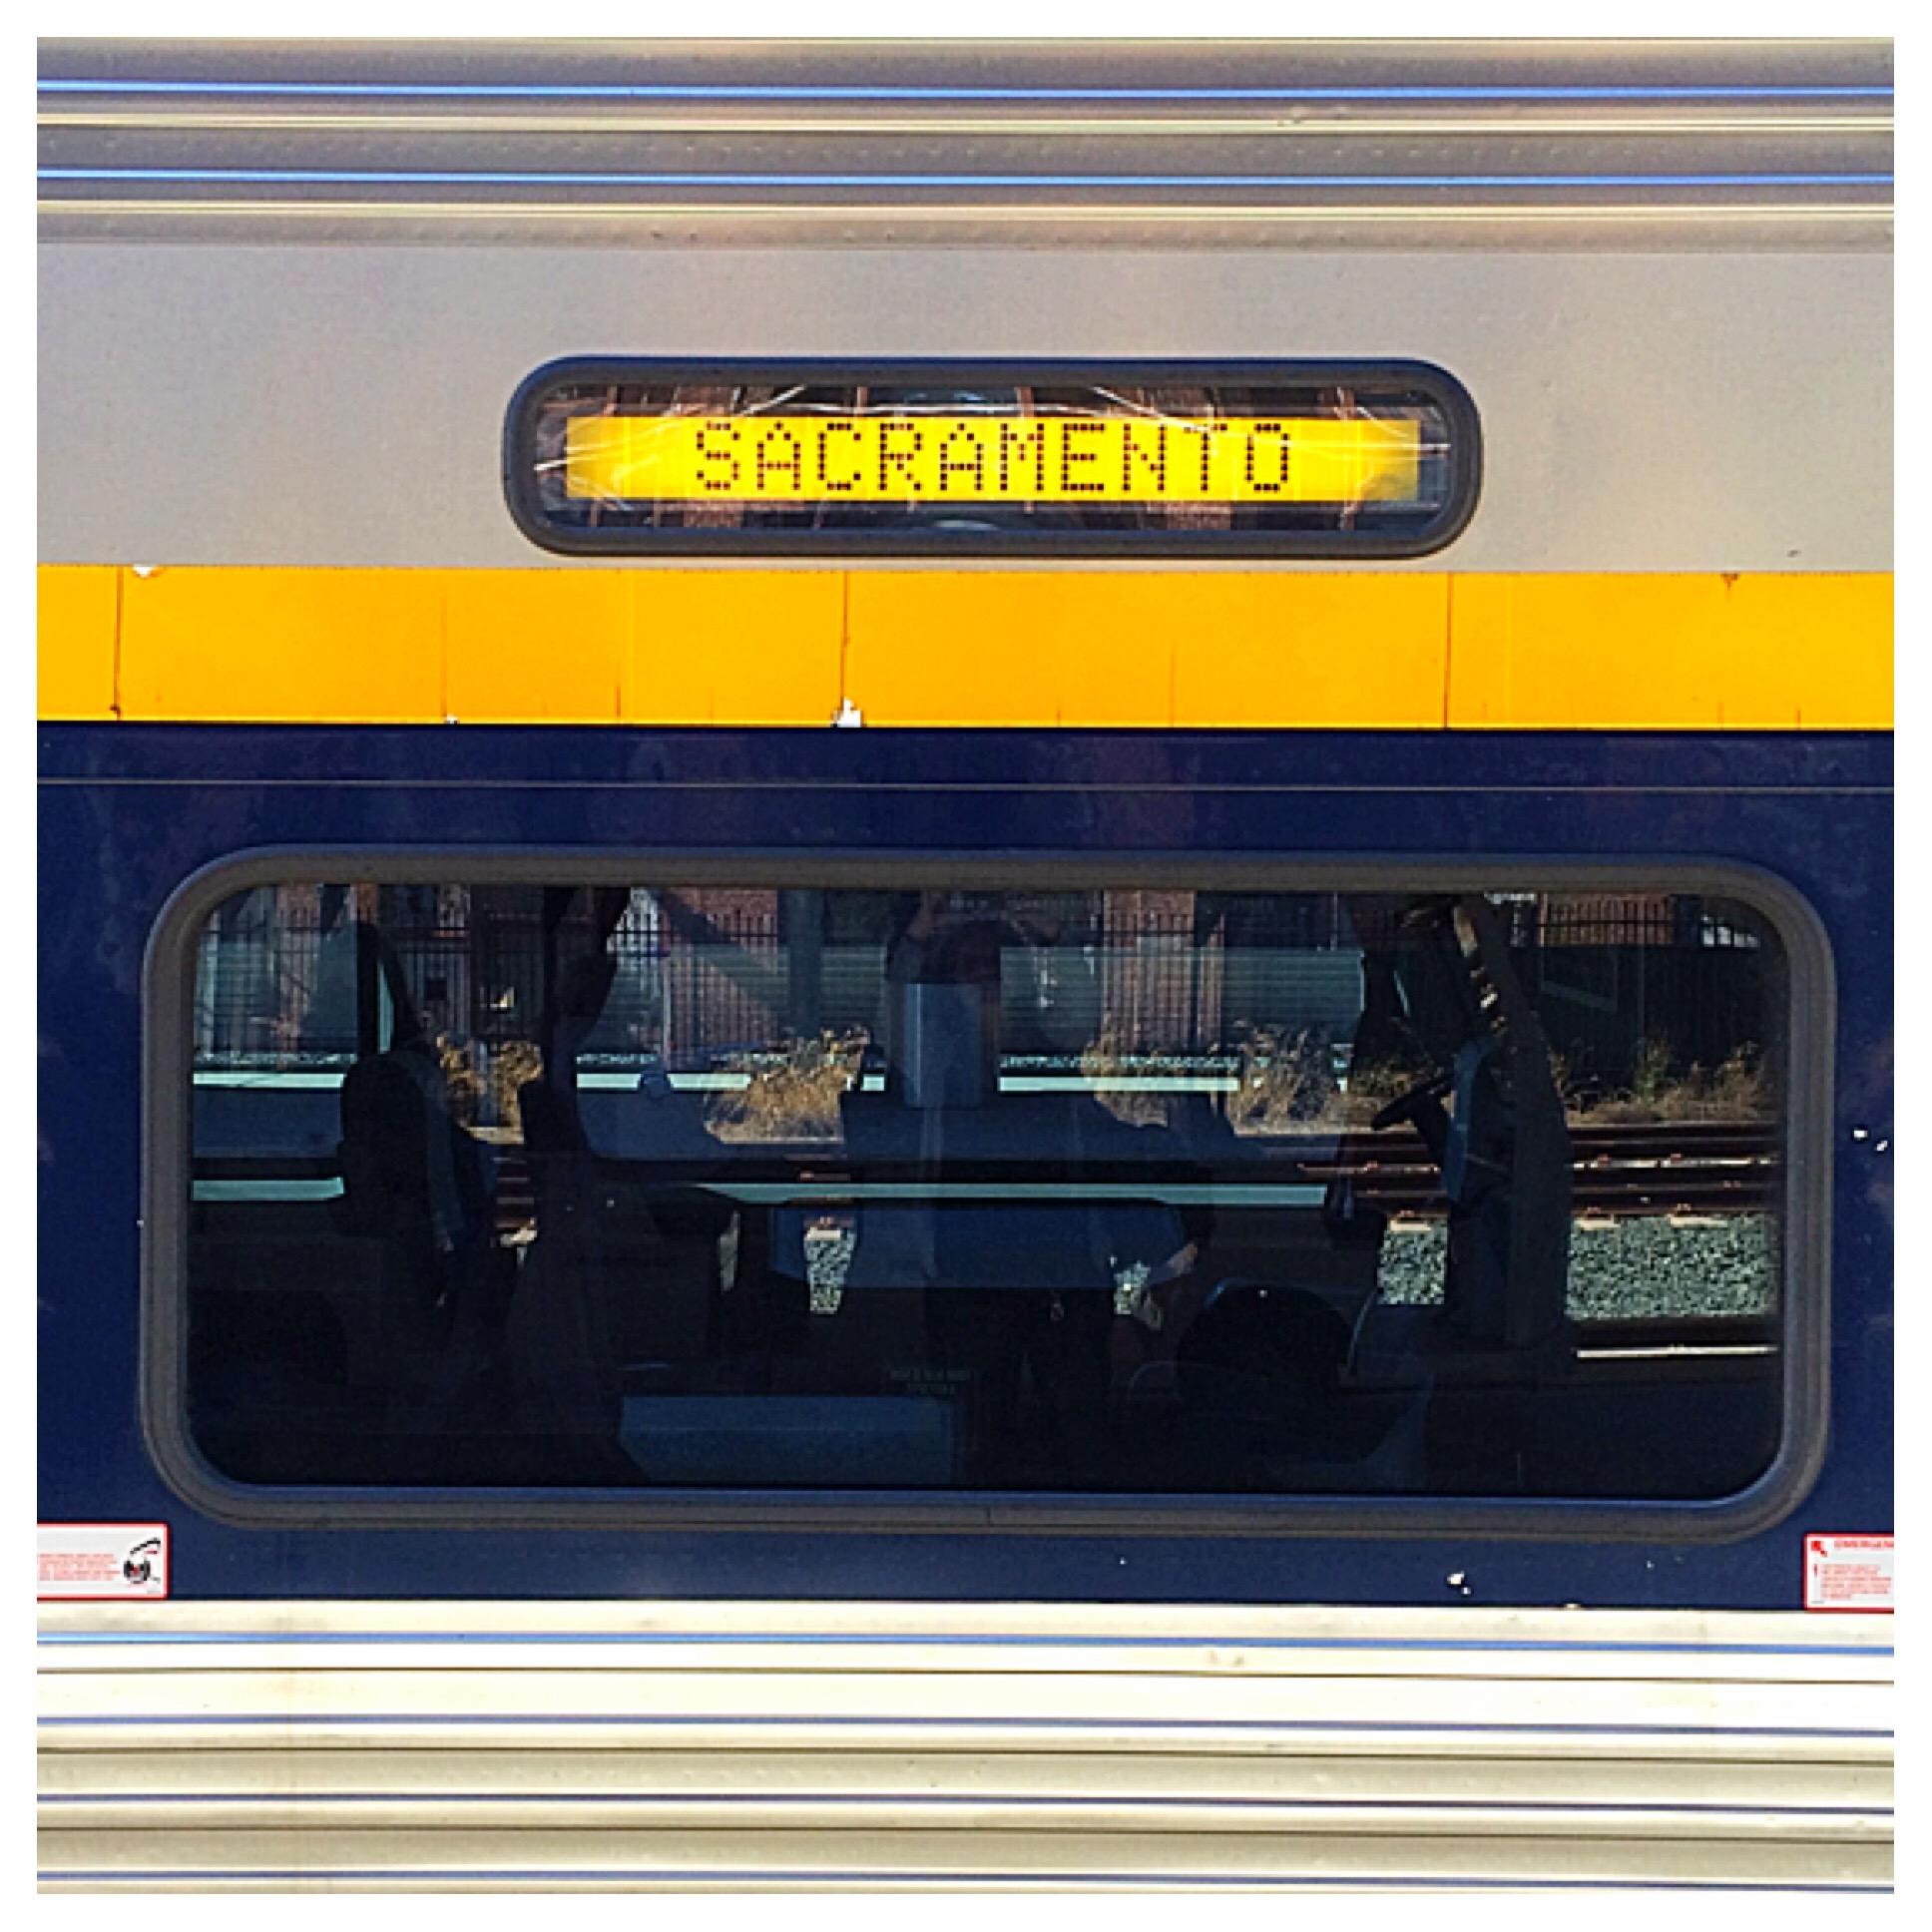 We took the train!